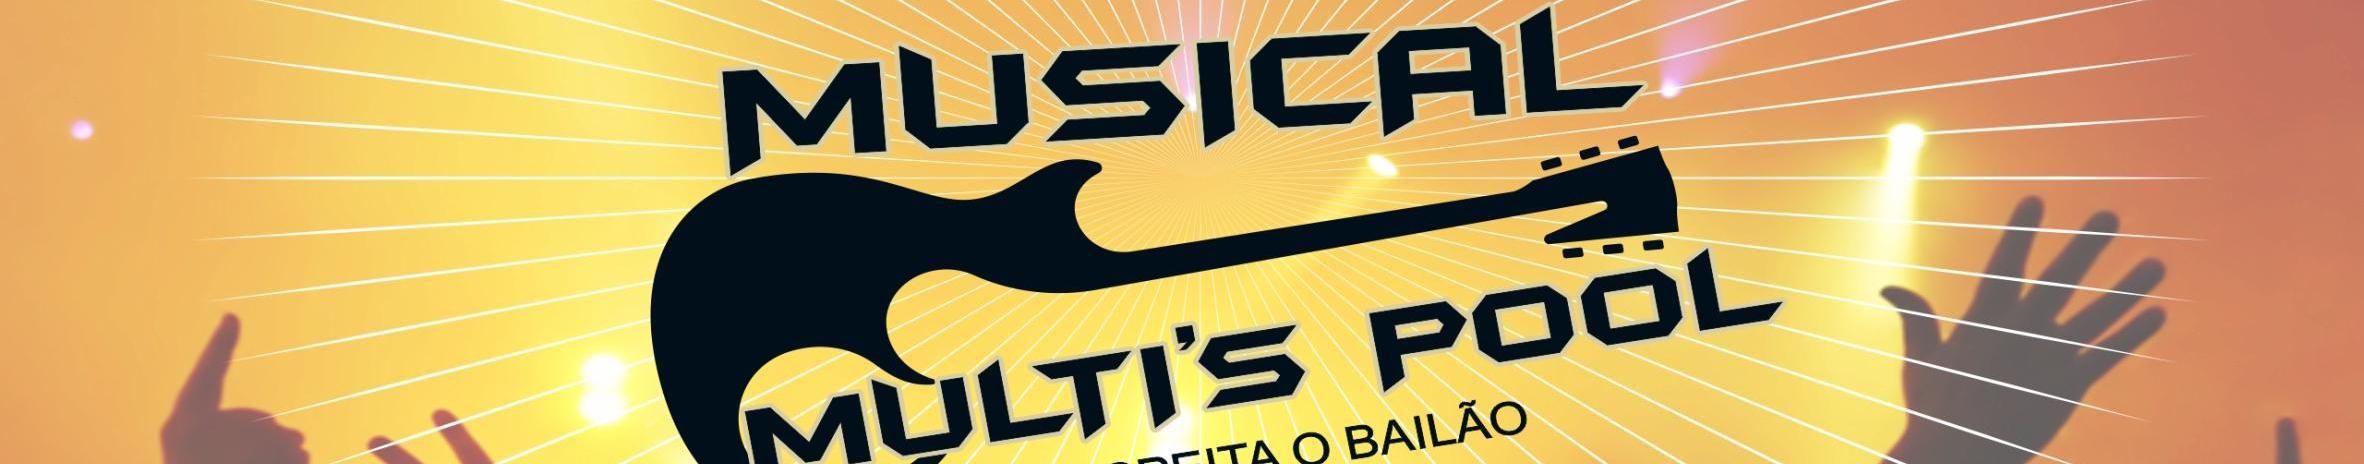 Imagem de capa de MUSICAL MULTI'S POOL